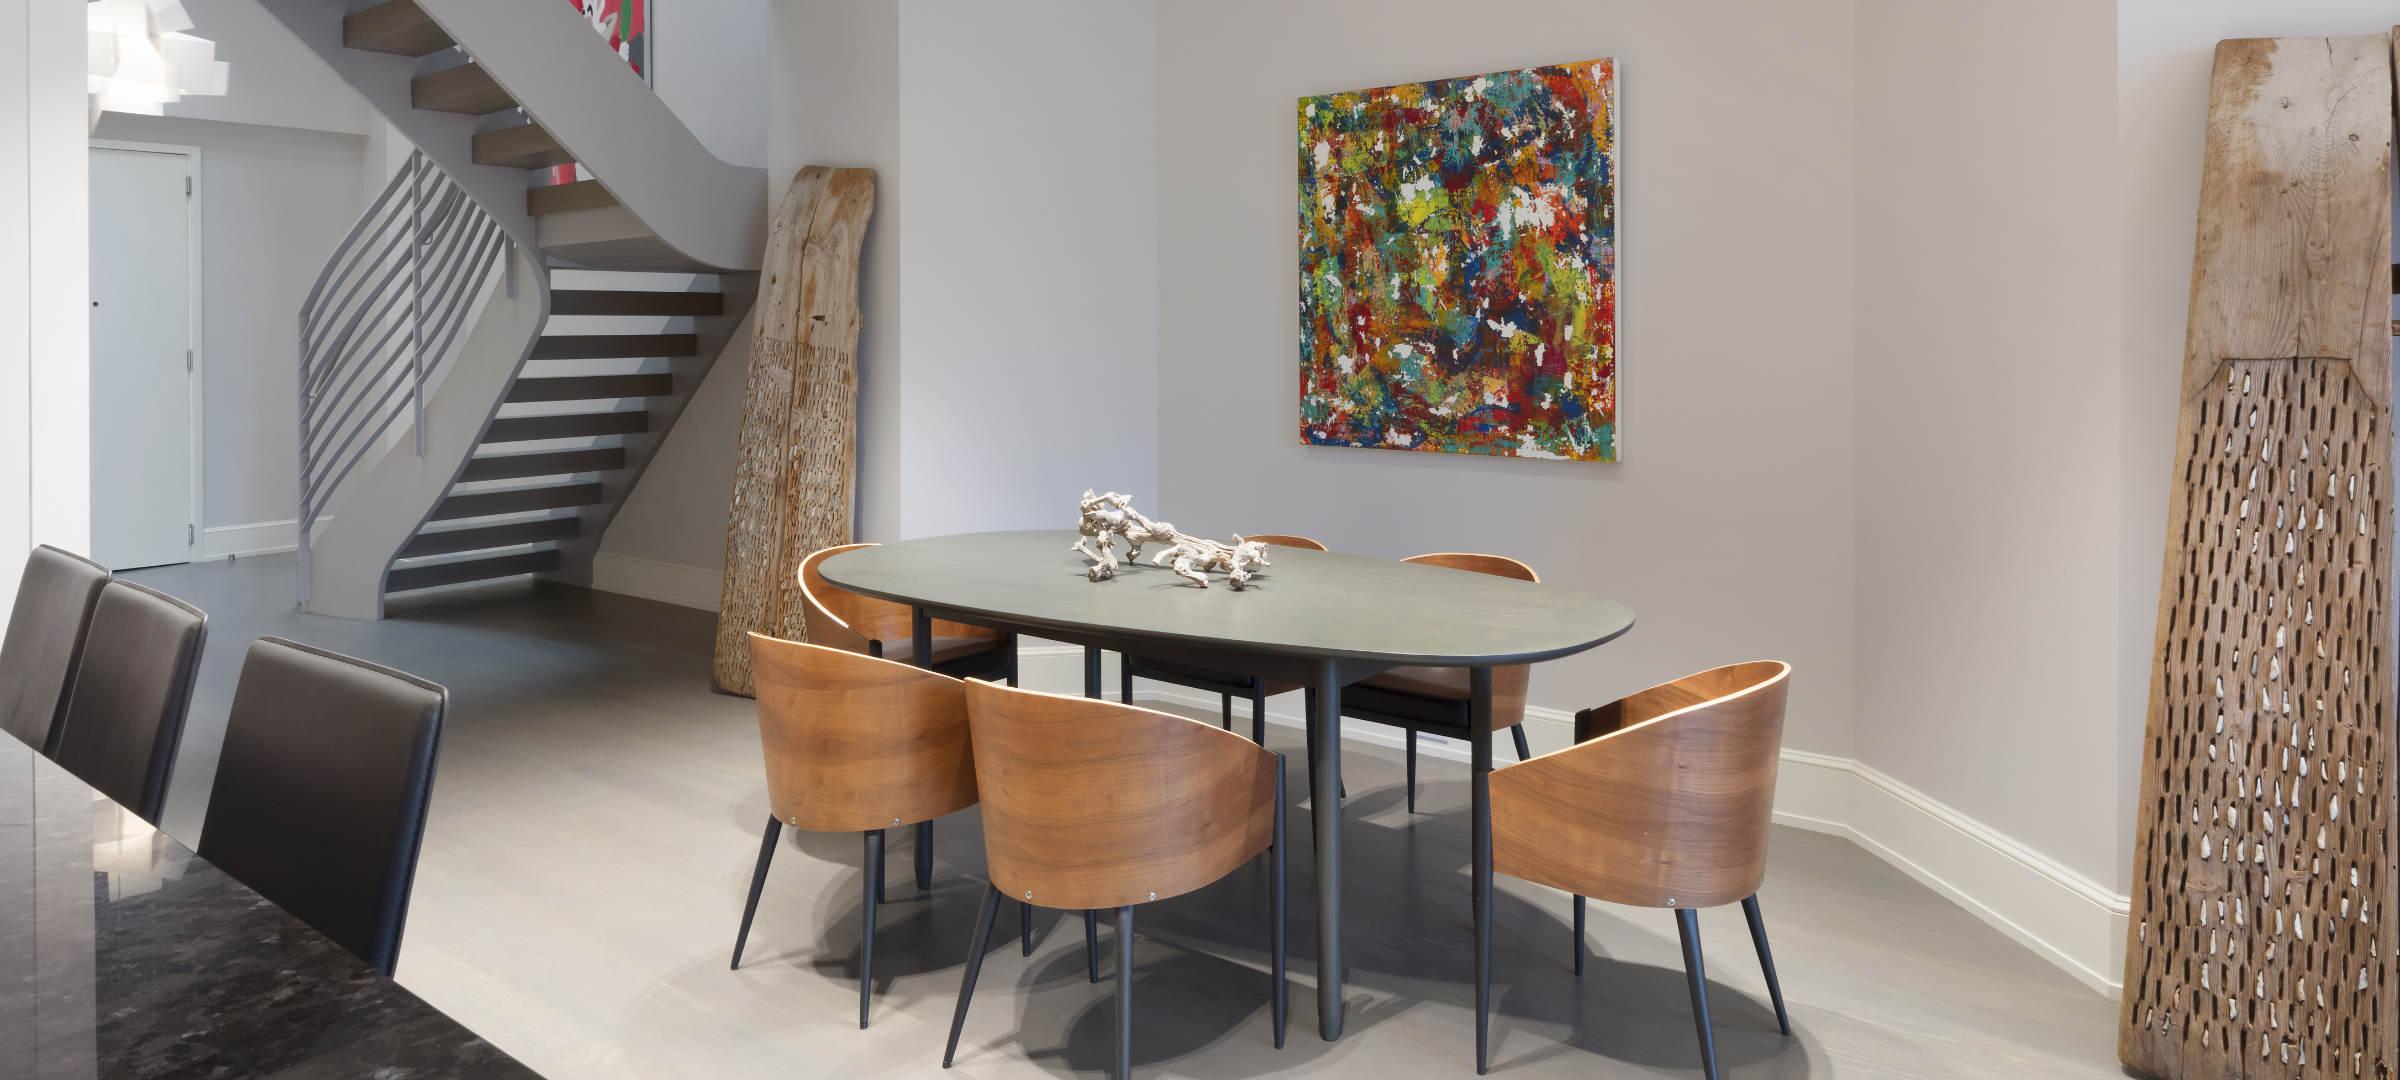 SBSG Interior Design Dining Room 260 Park Avenue South, NY